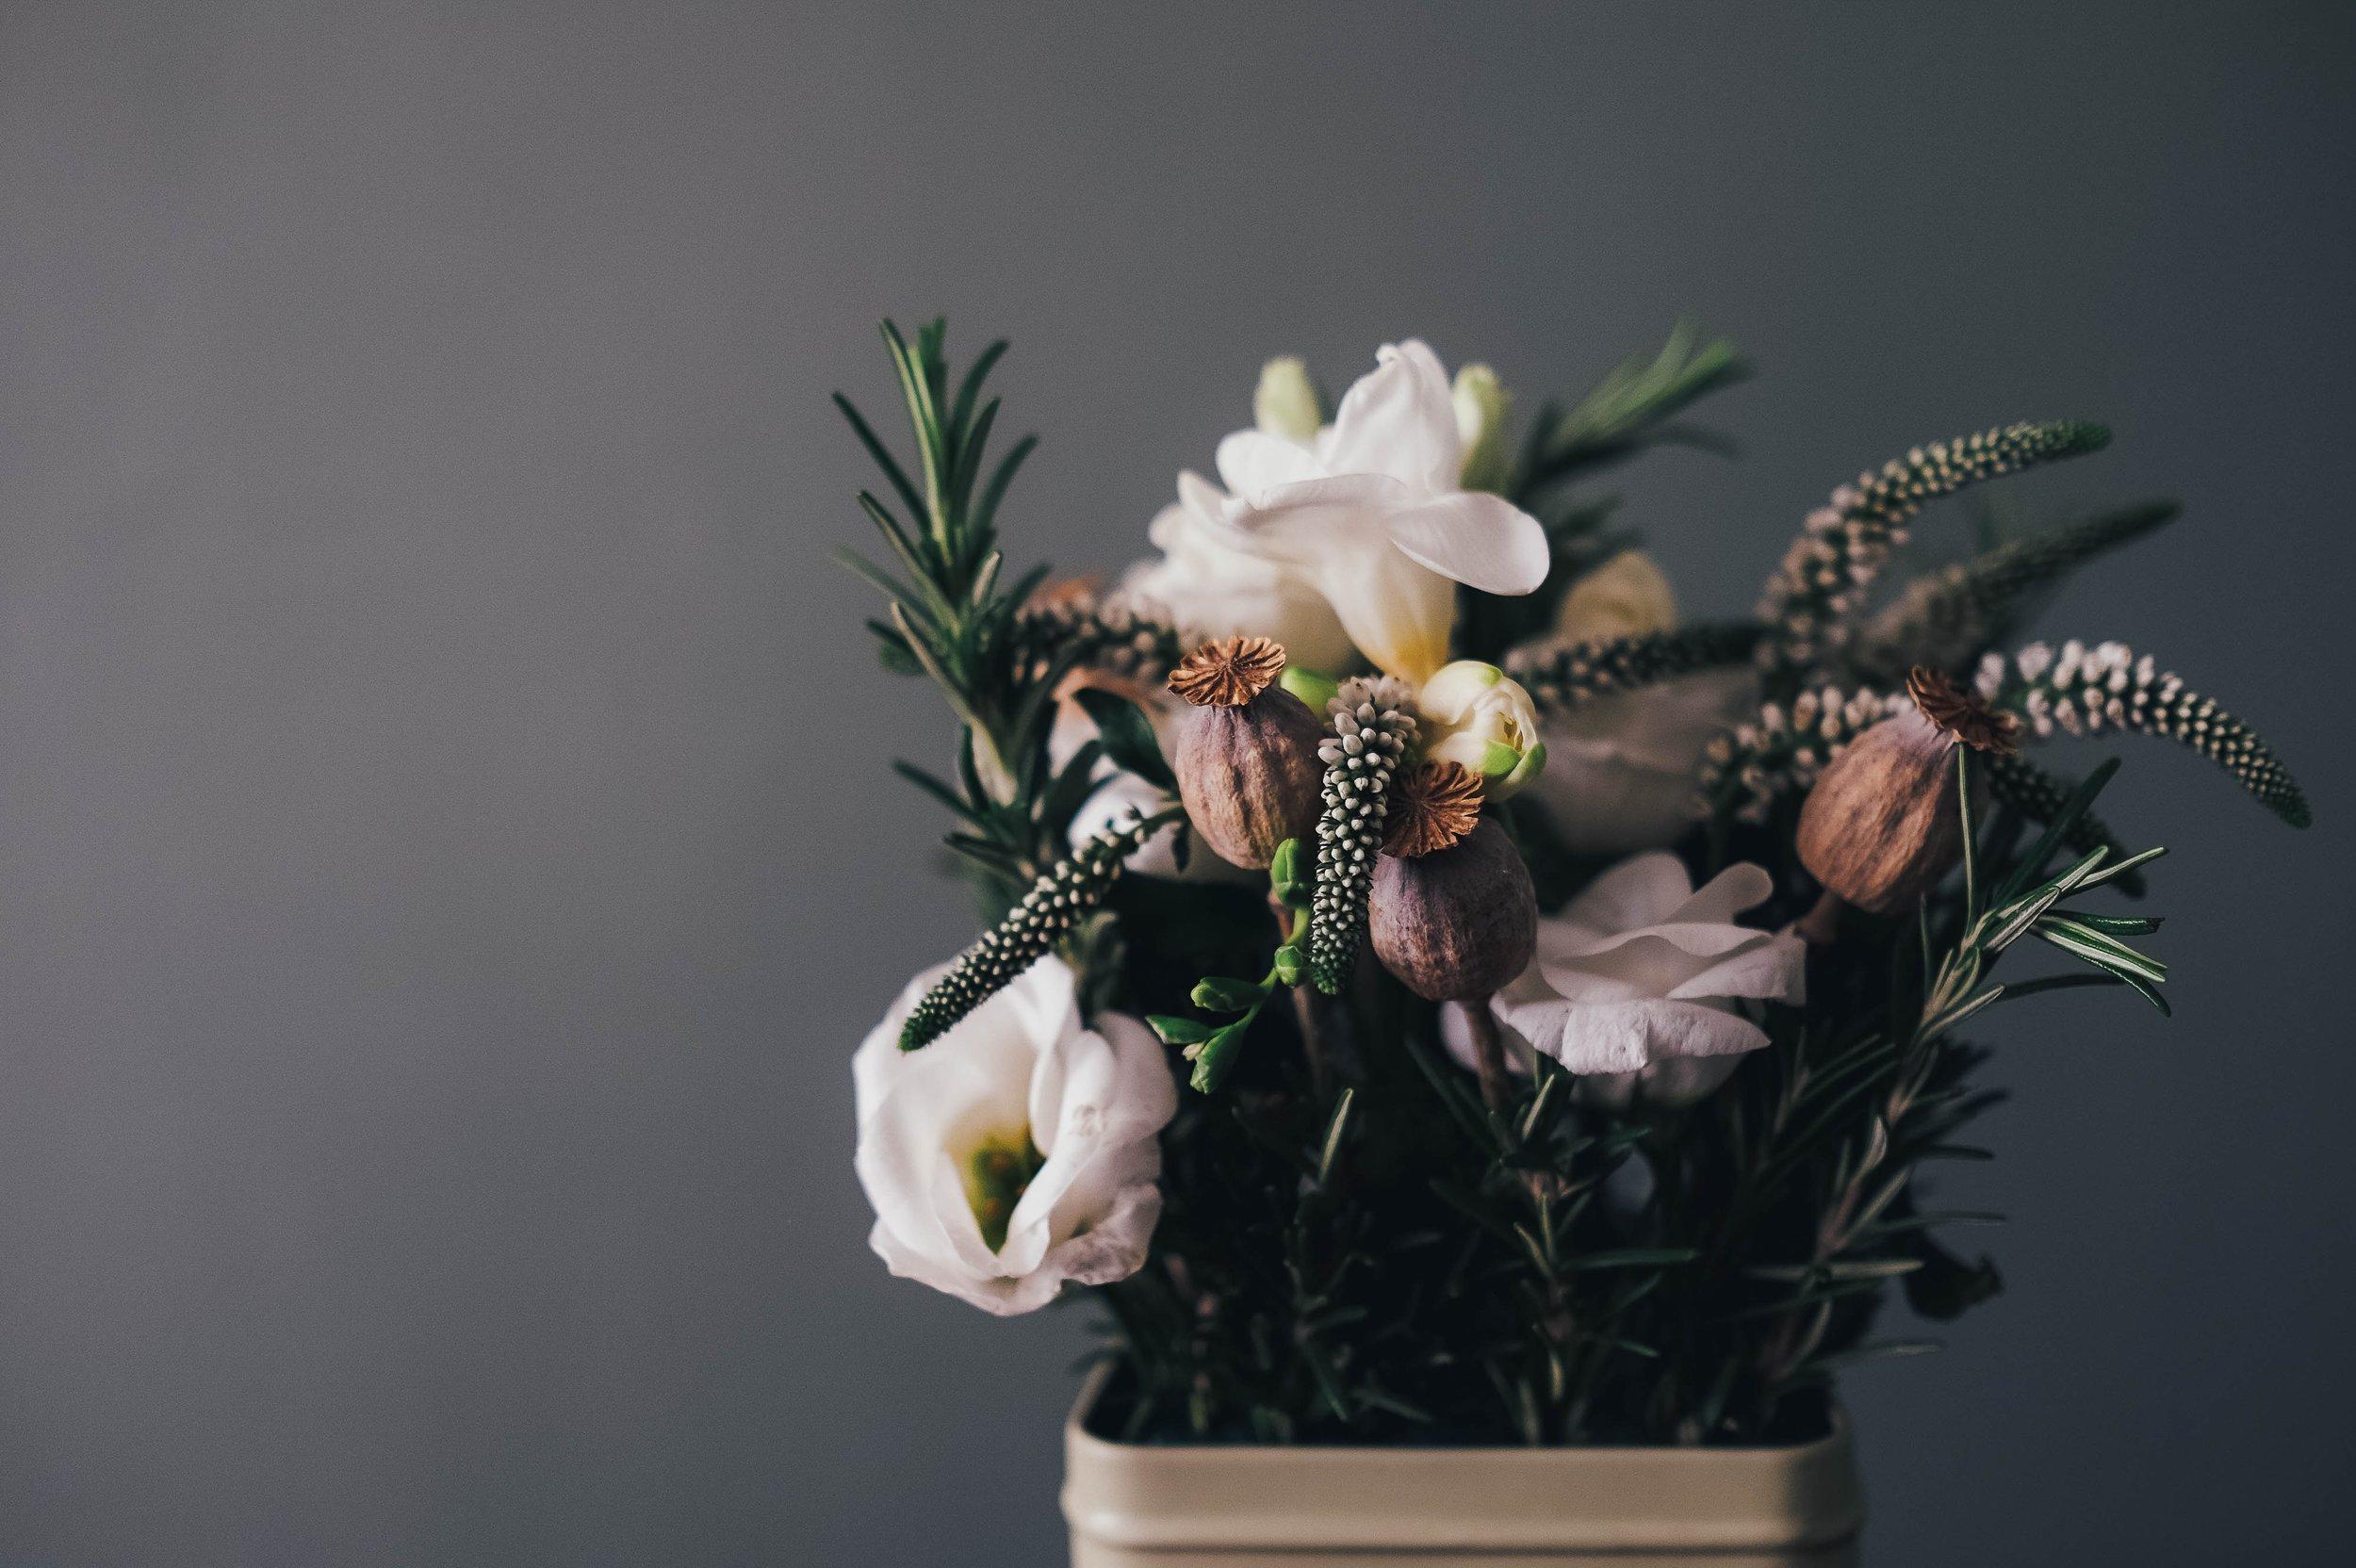 Recycle compost flowers rebloom annie spratt 59116g izmirmasajfo